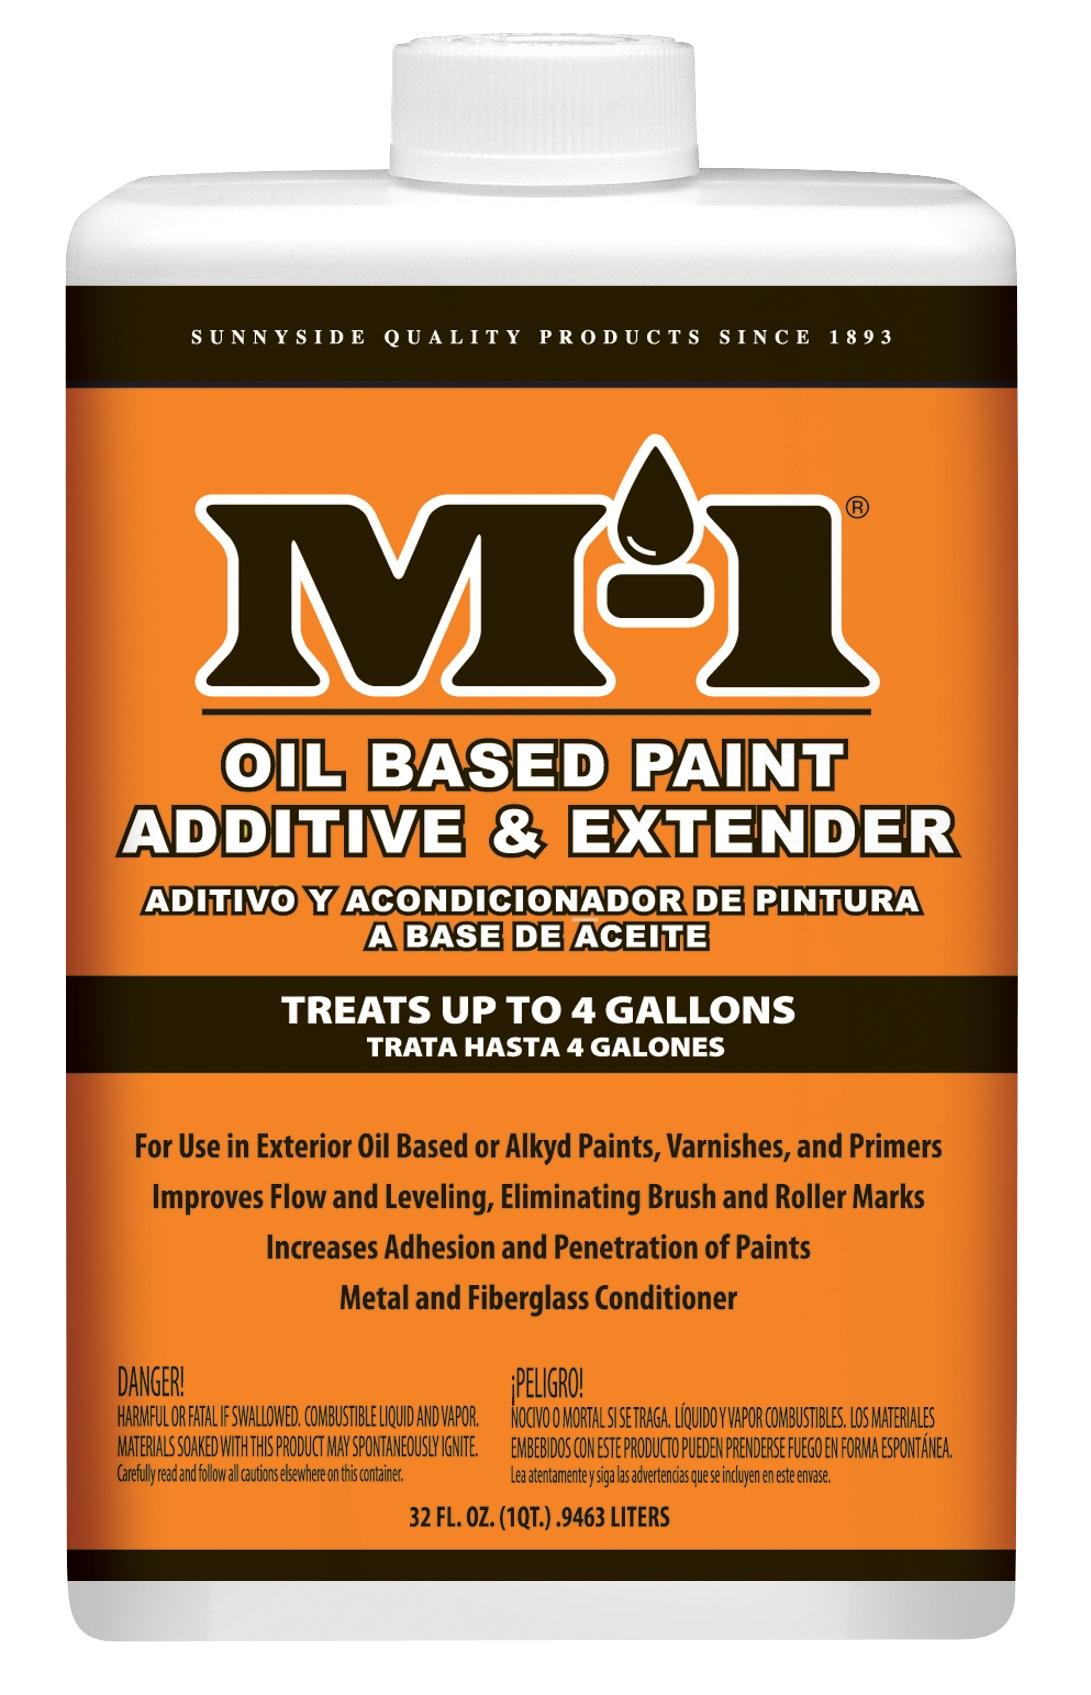 M 1 Oil Based Paint Additive Extender